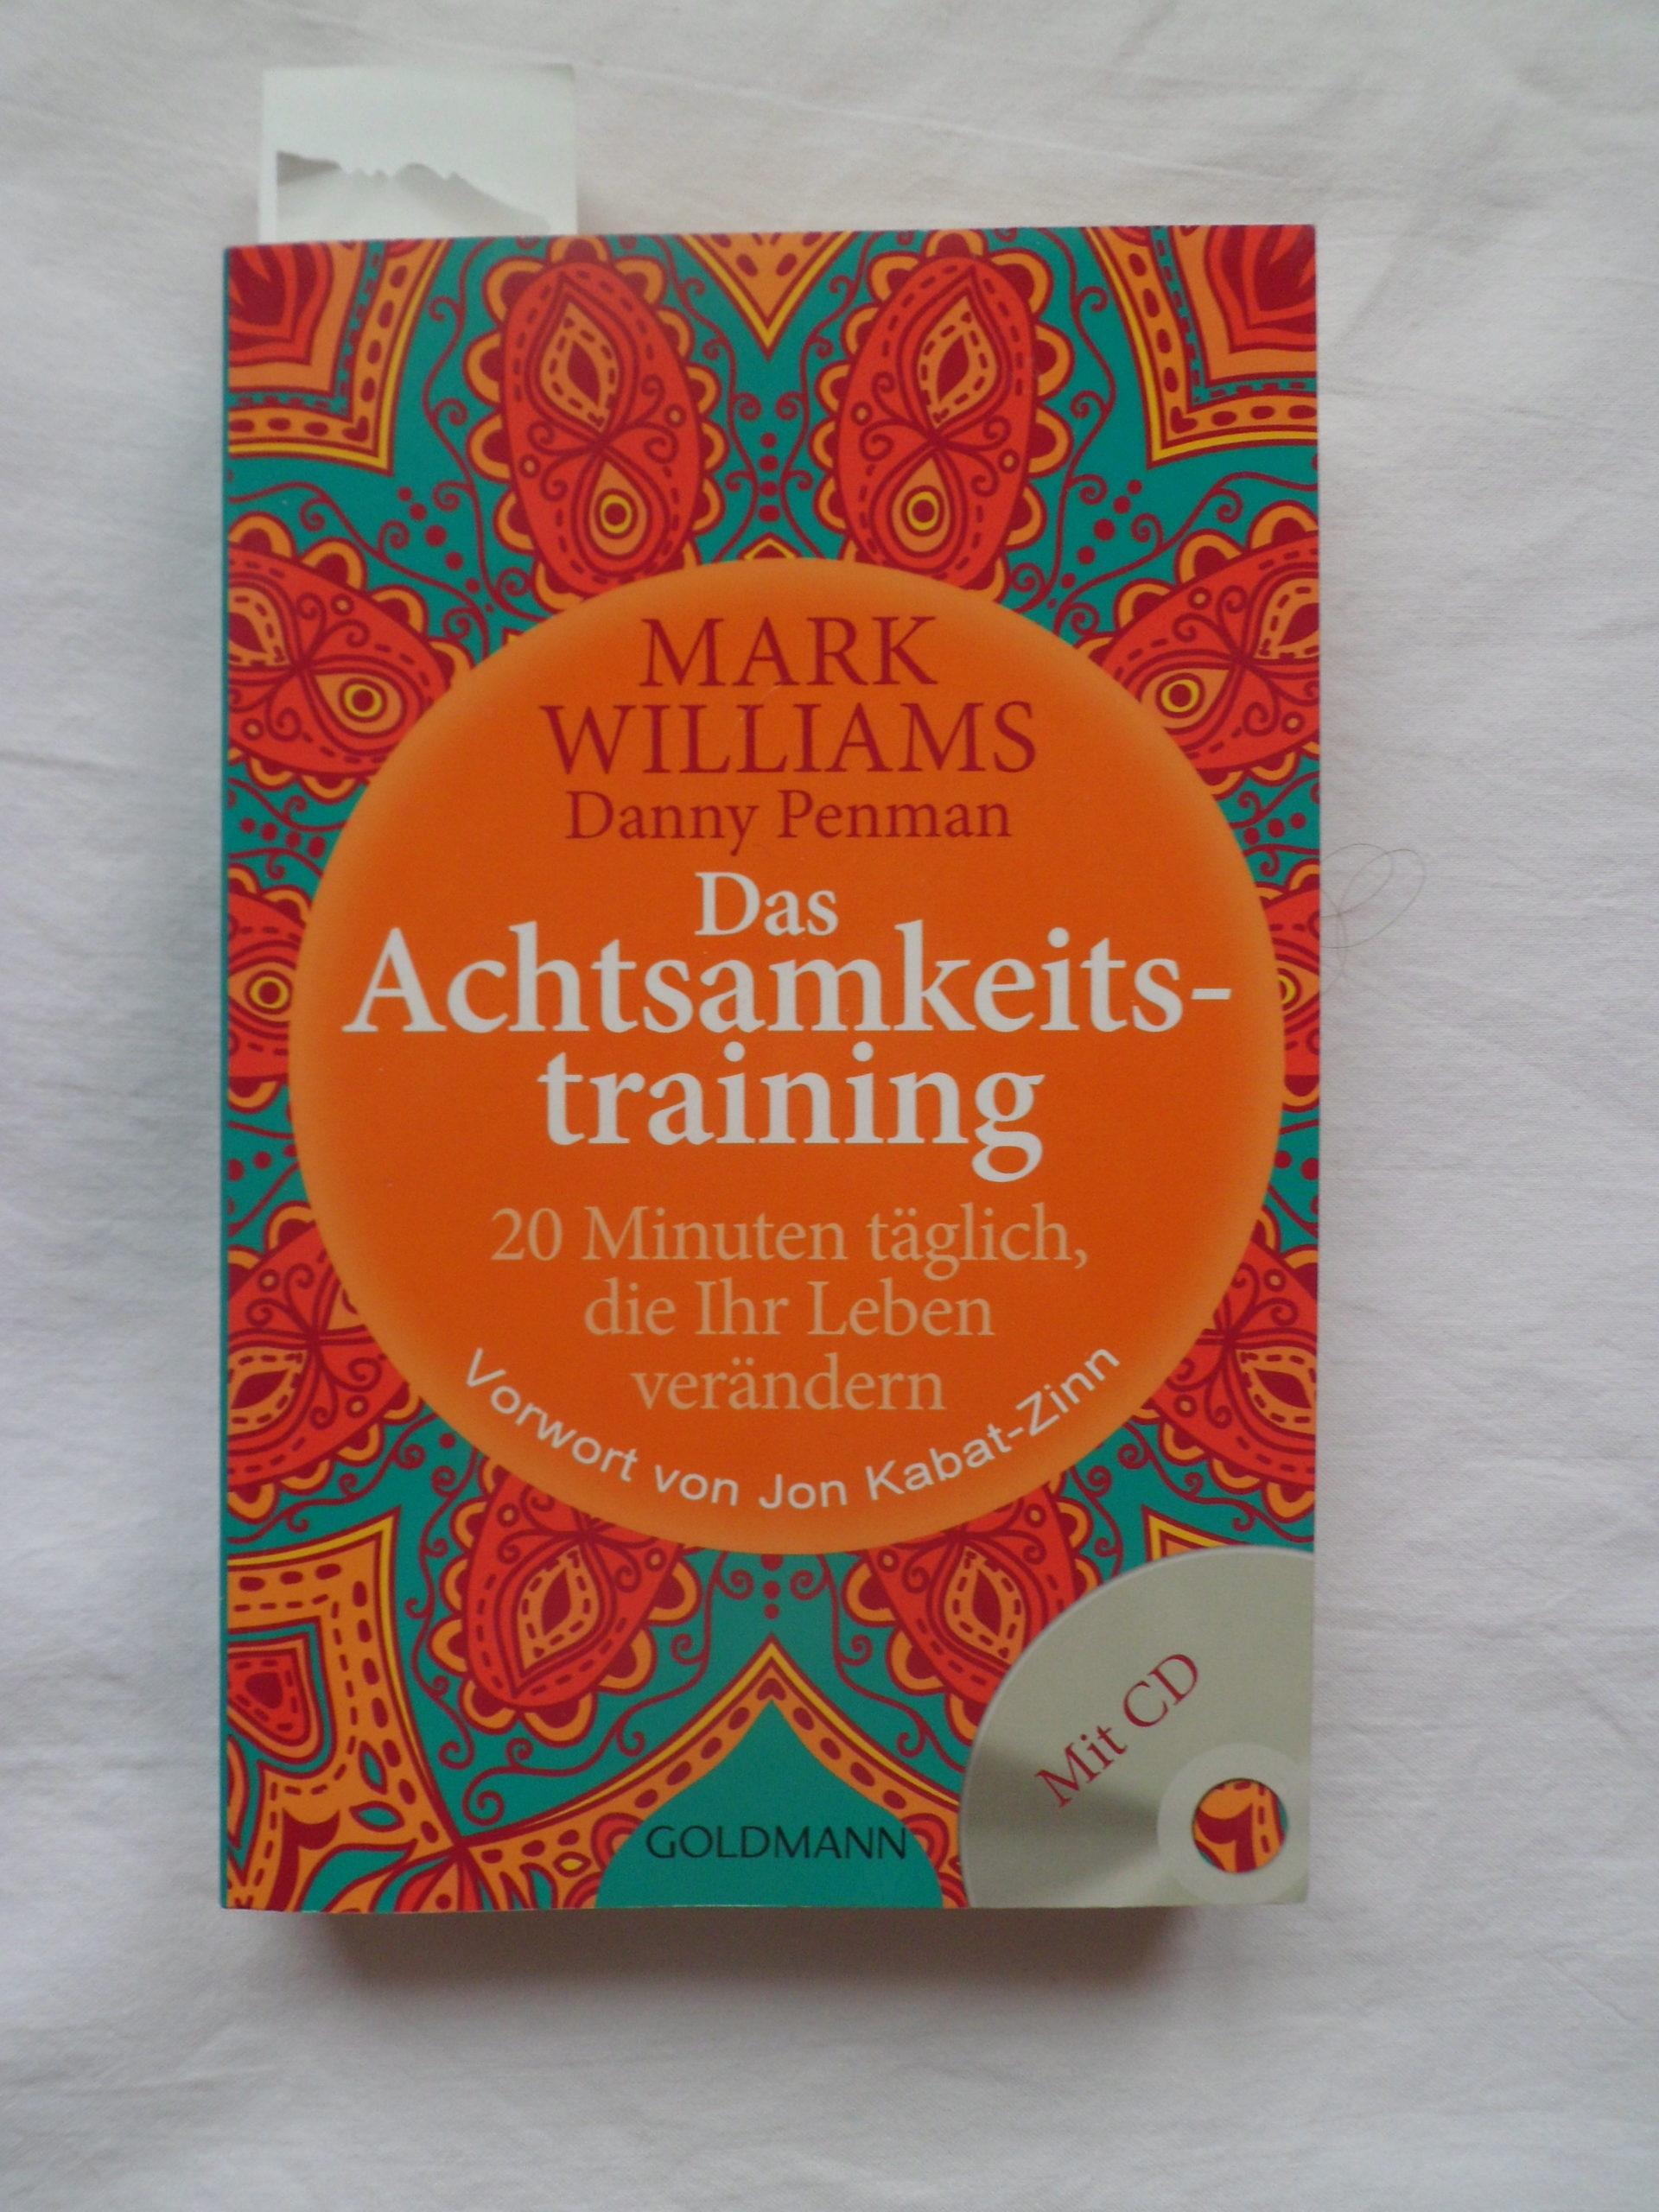 Das Achtsamkeits-training